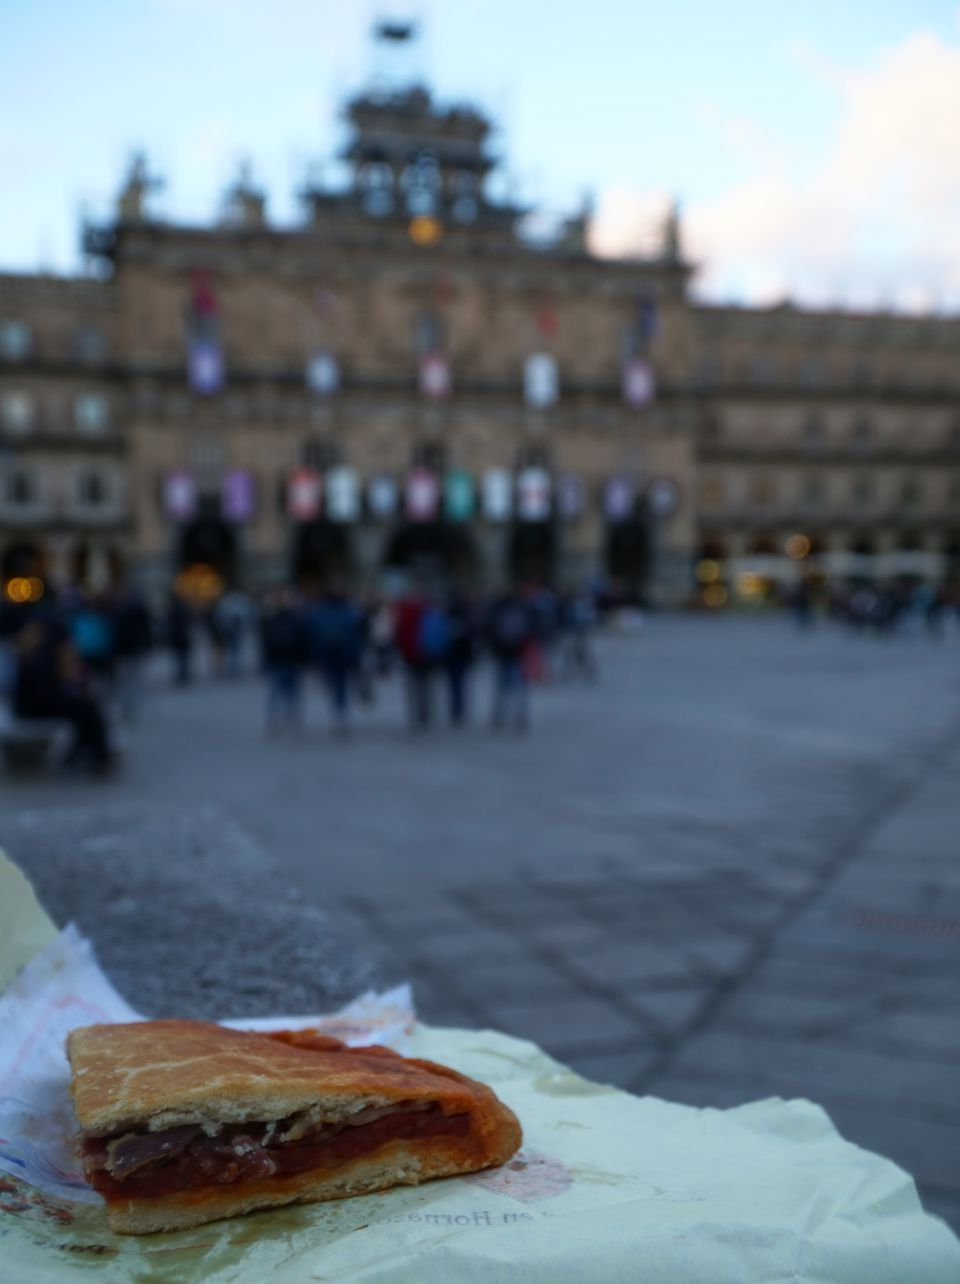 Hornazo chorizo and ham pastry, in Plaza Mayor in Salamanca